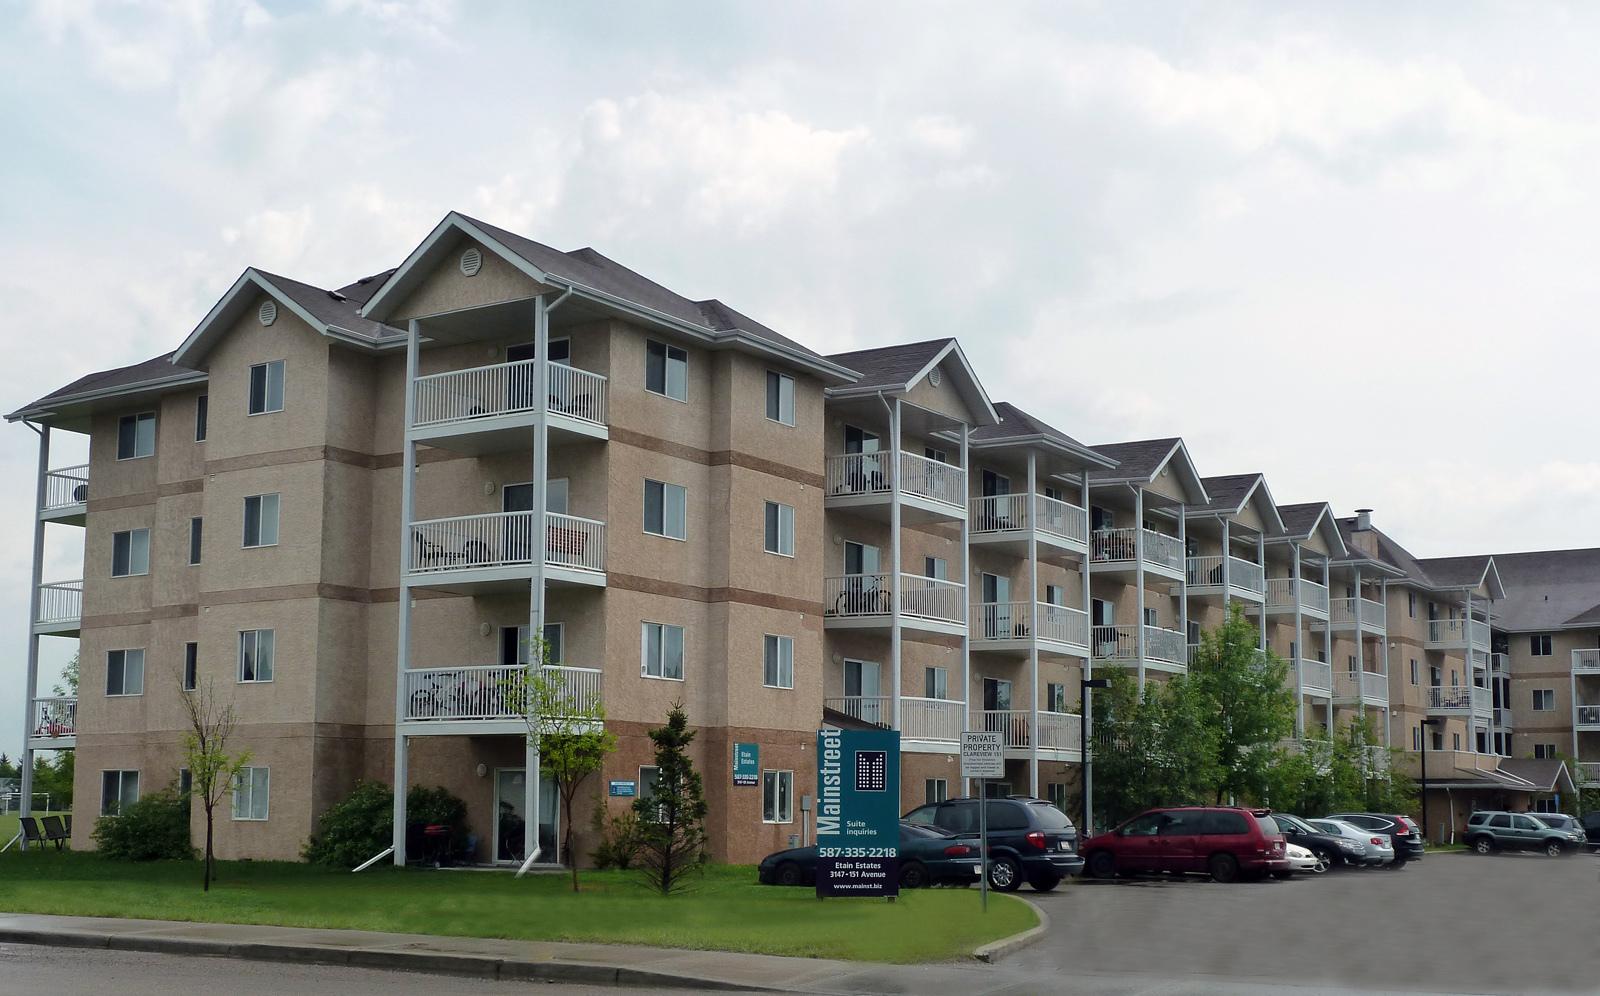 3147 151 Avenue NW, Edmonton, AB - $1,047